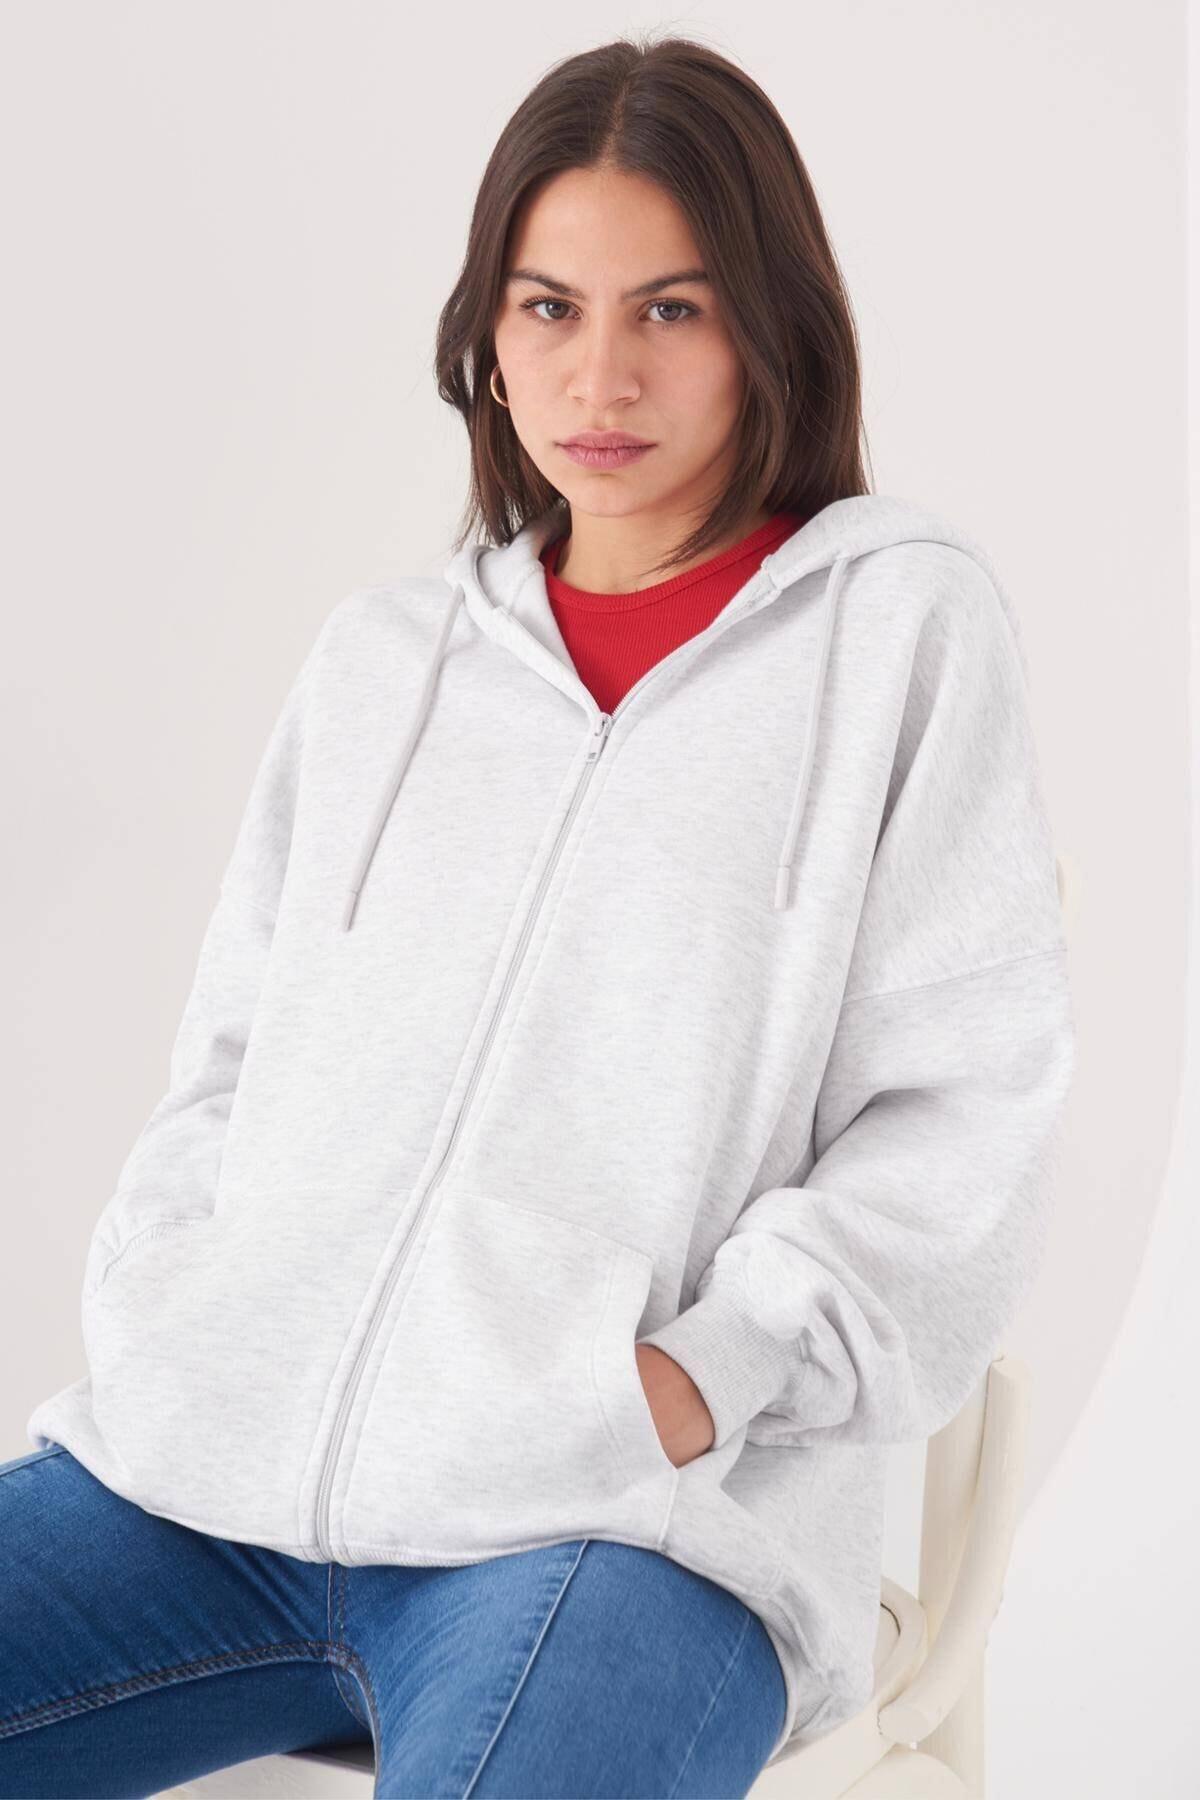 Addax Kadın Kar Melanj Kapüşonlu Uzun Hırka H0725 - W6 - W7 Adx-0000020316 1